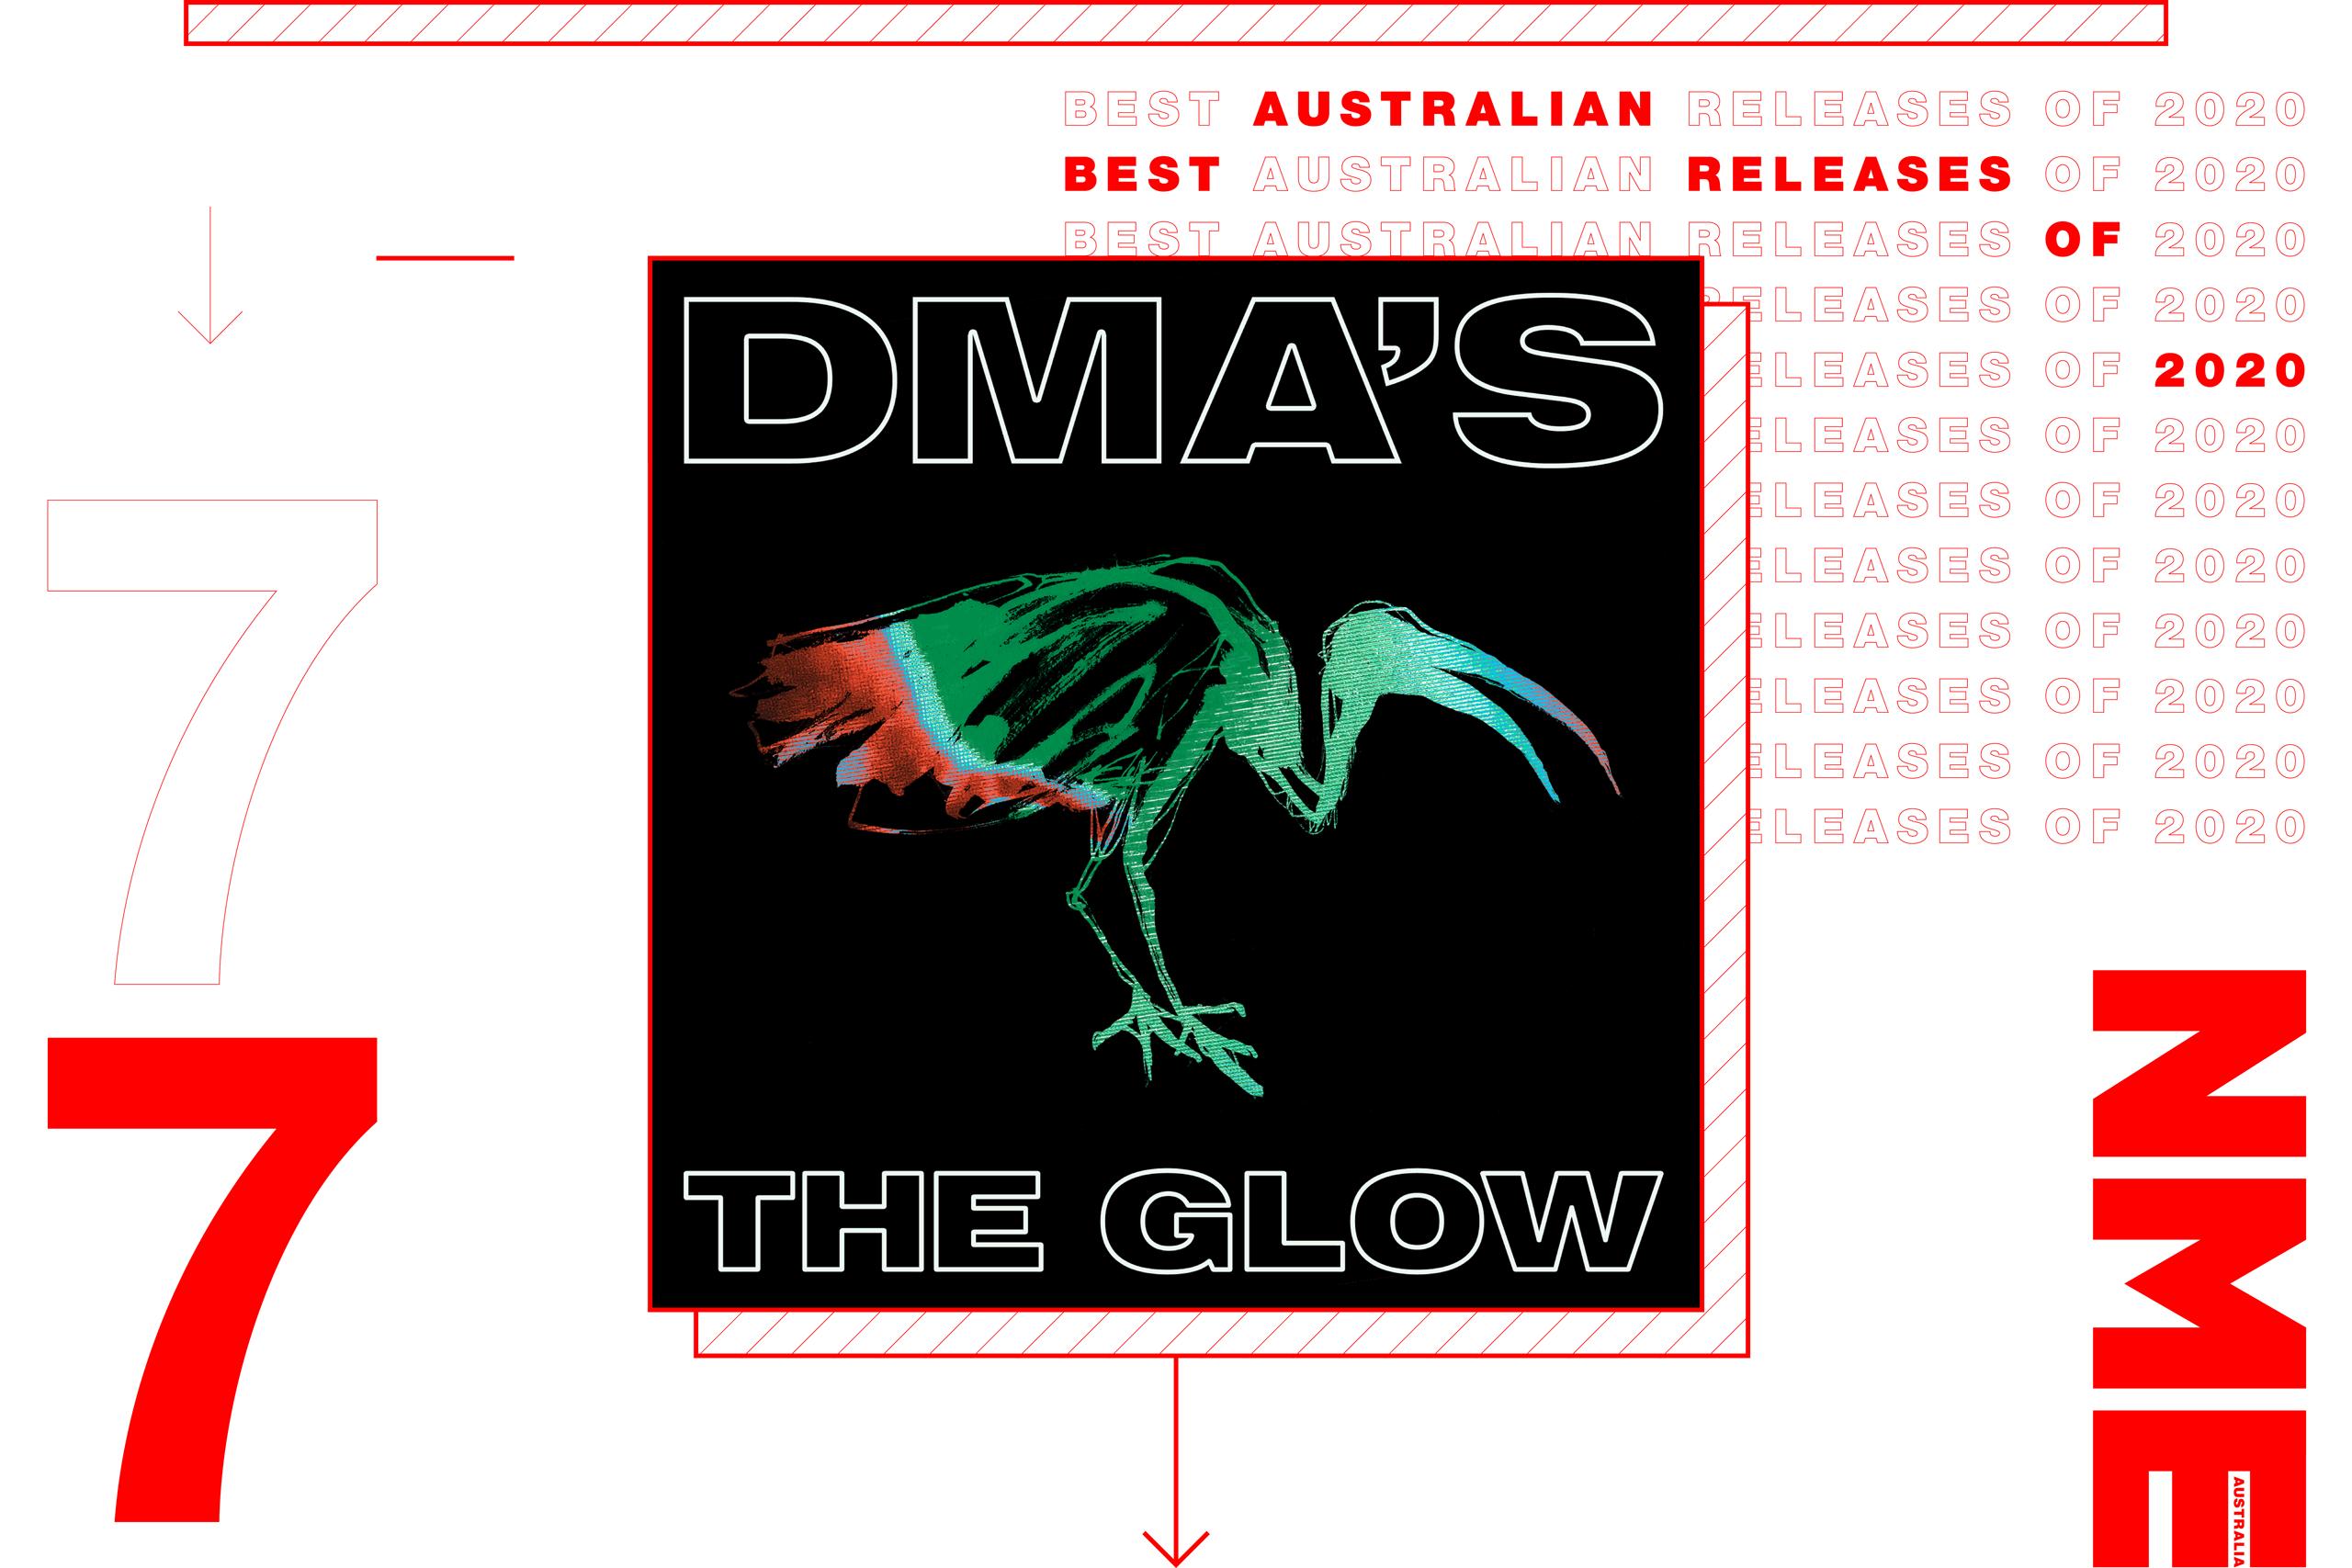 NME Australian Album Release 7